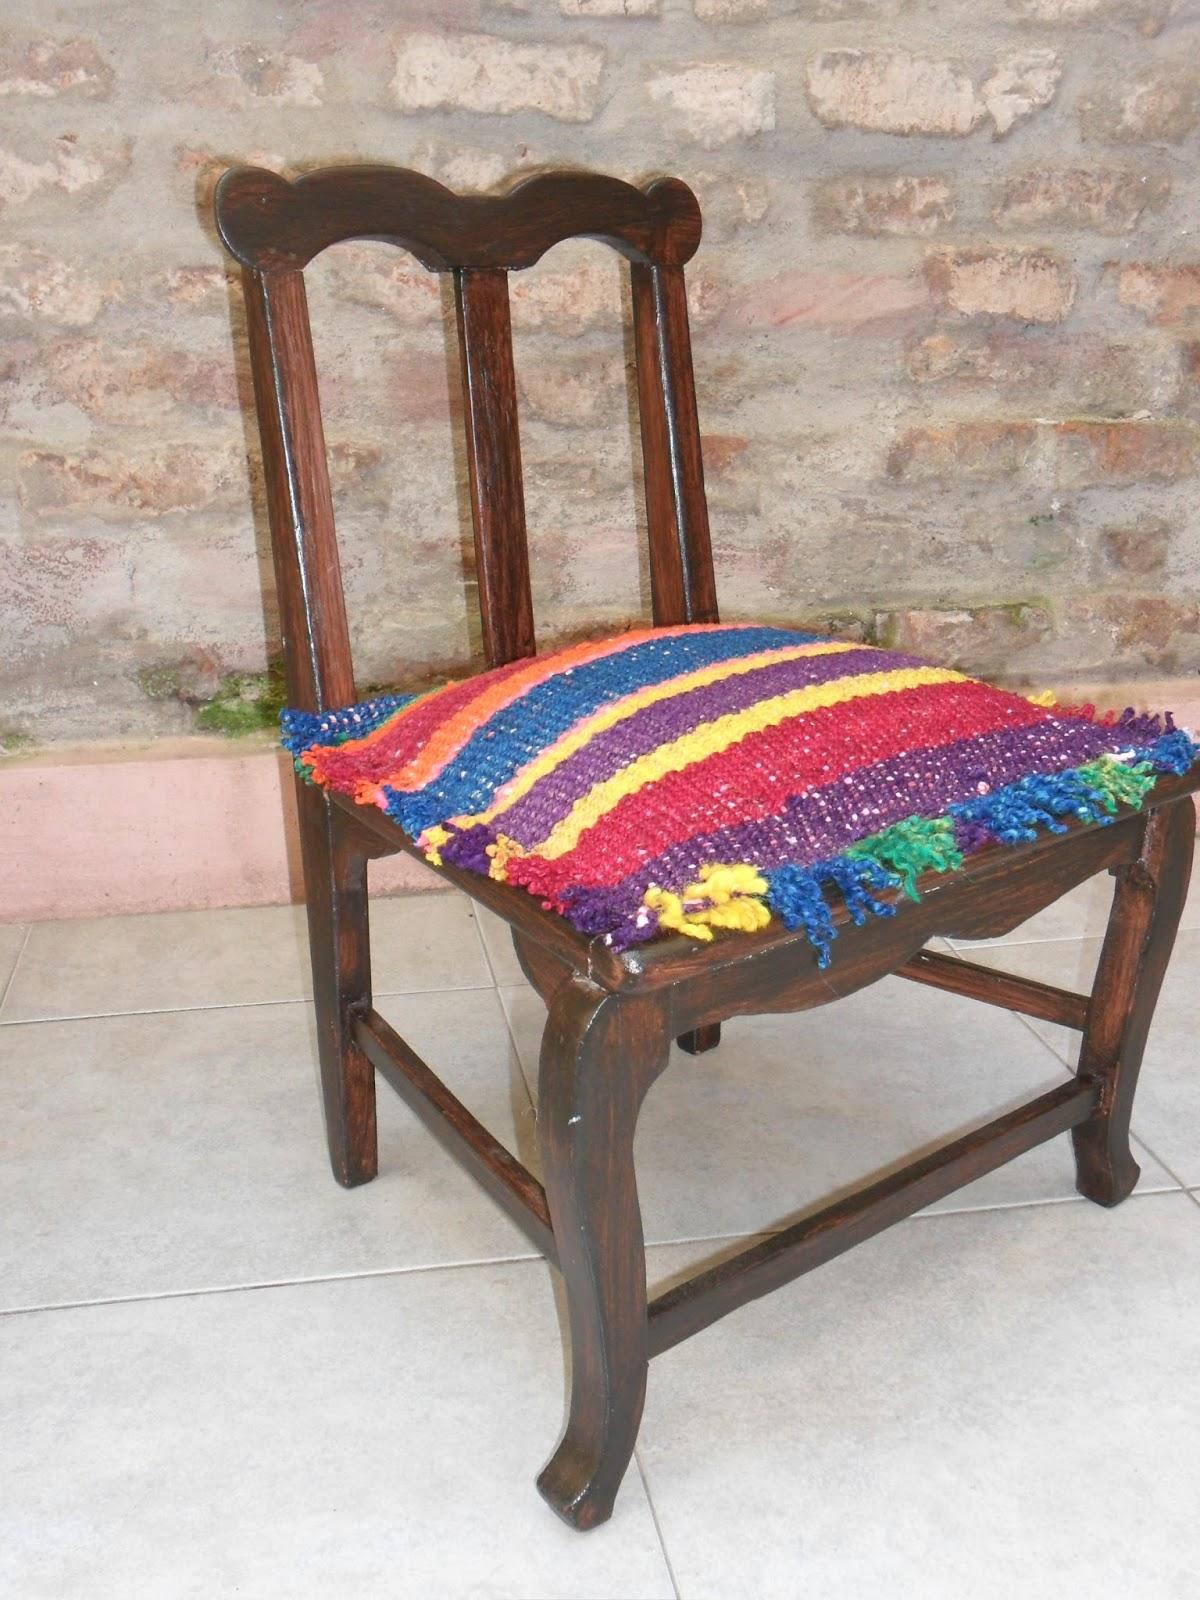 El taller de beatriz sevilla tapicer a - Talleres de tapiceria ...